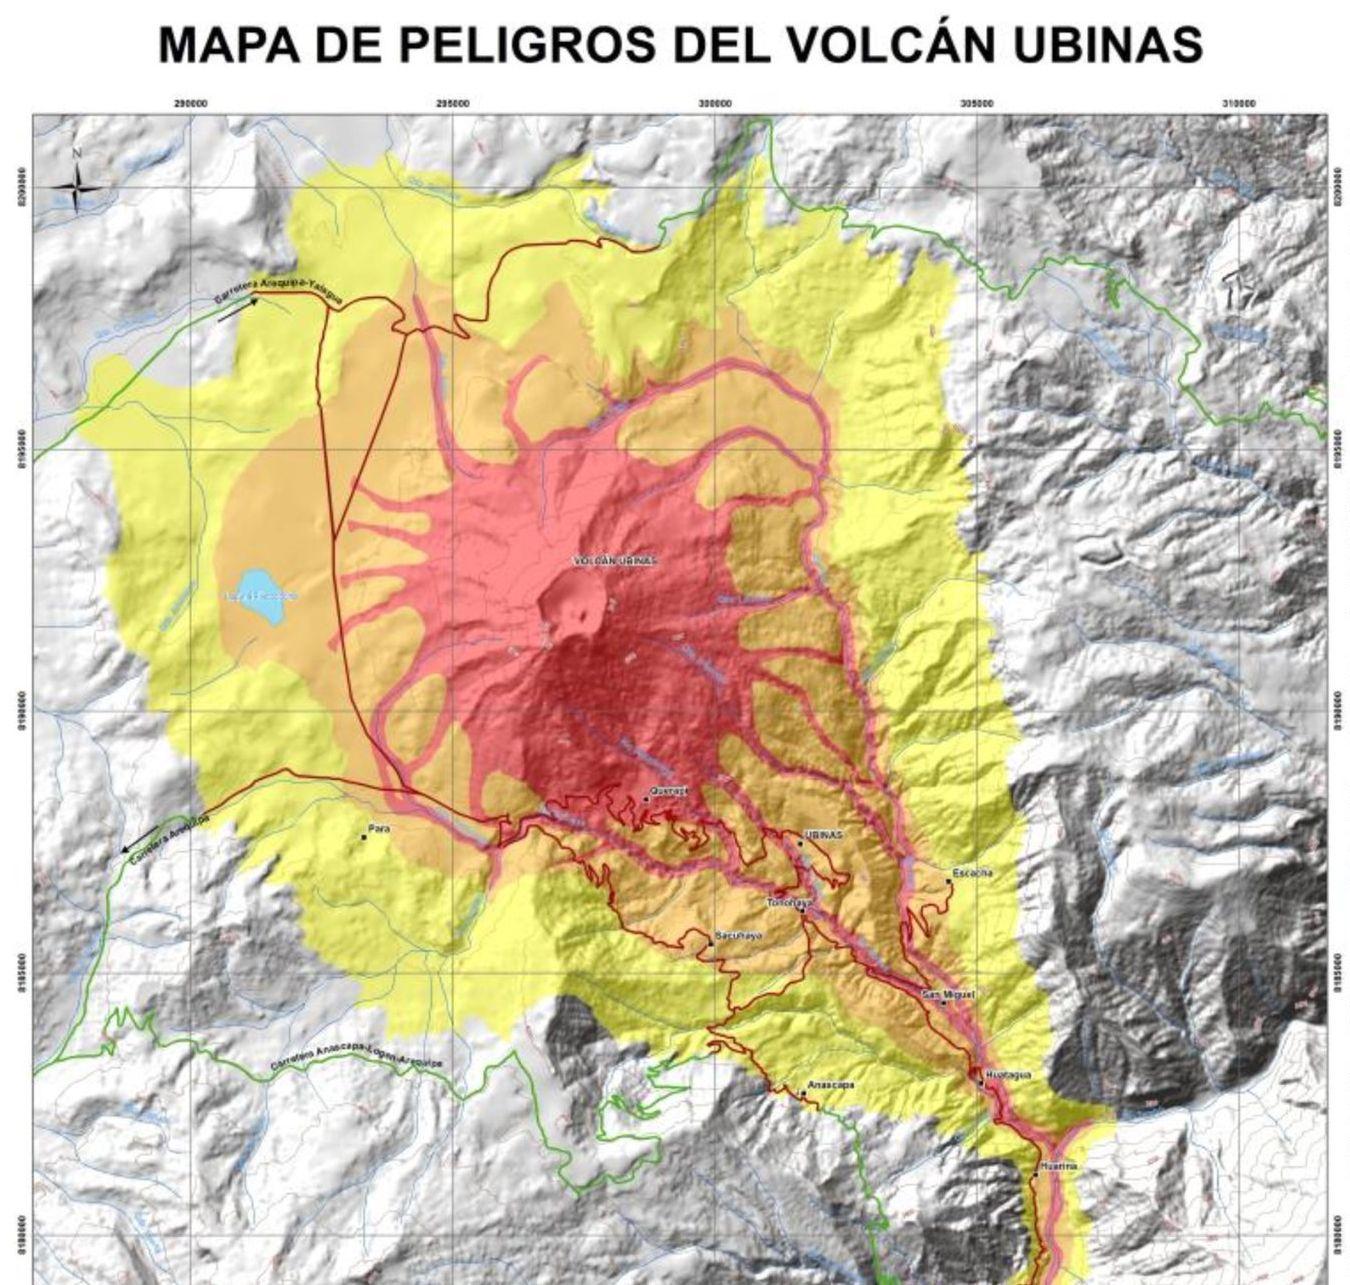 Mapa del Volcán Ubinas. (Ingemmet)